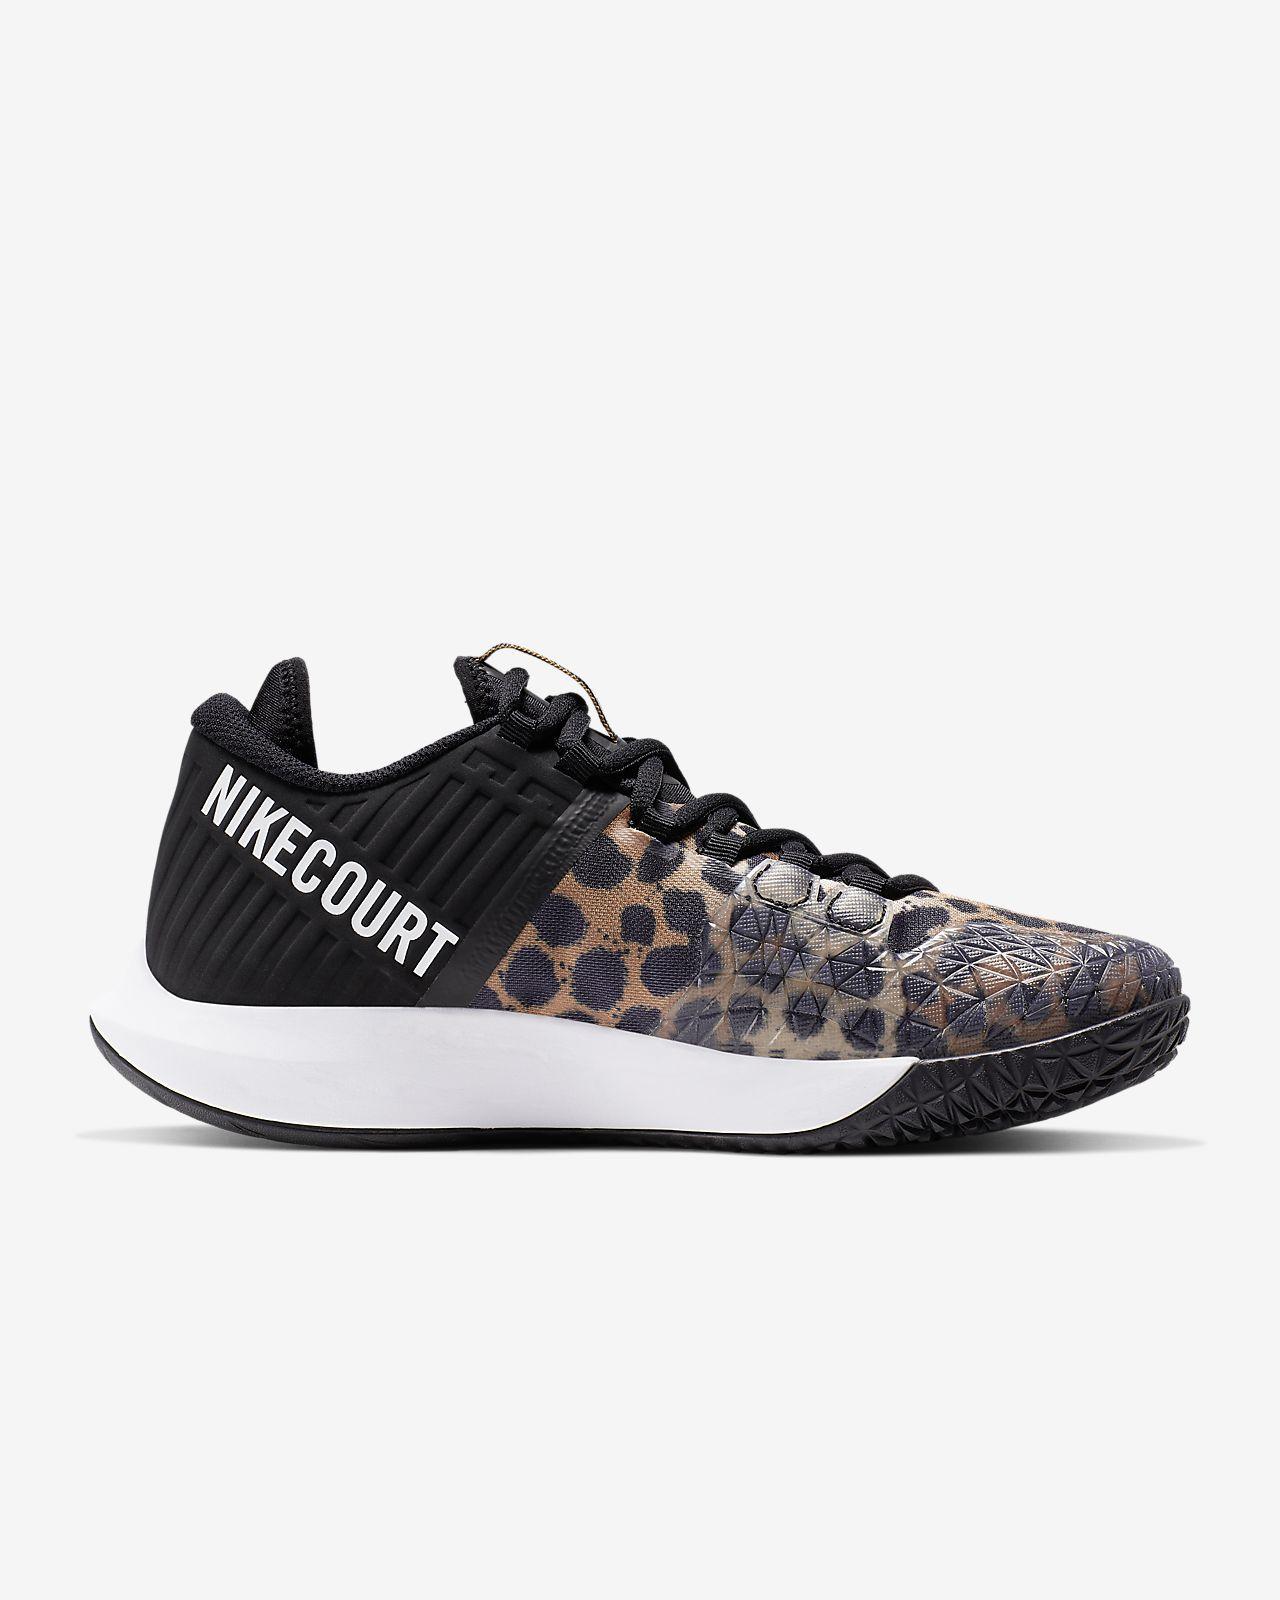 Italia Nike Air Max Zero, Donne Donne Nero, Blu Heels